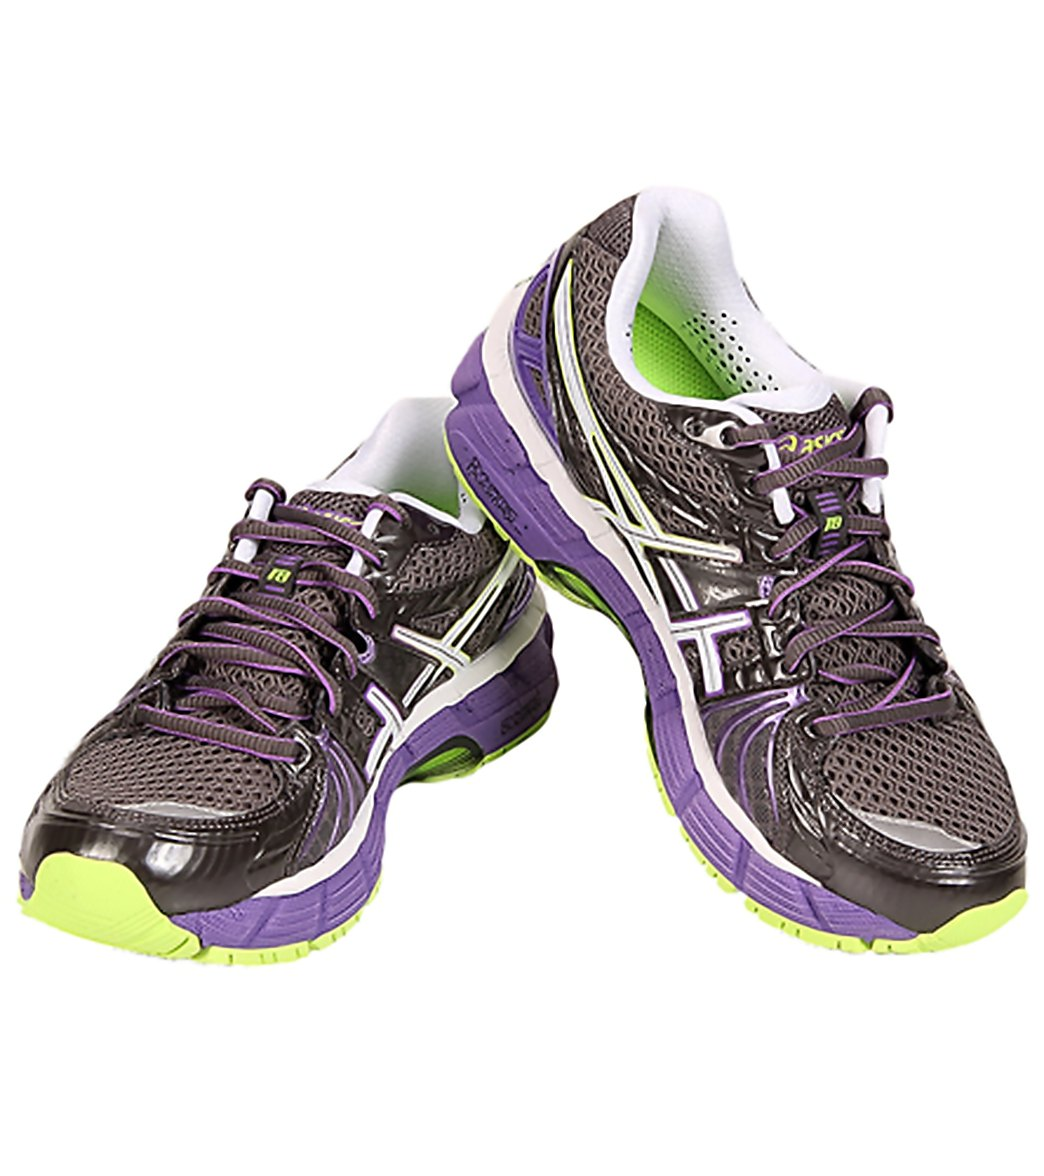 purchase cheap 94367 d5273 Asics Women s GEL-Kayano 18 Running Shoe at SwimOutlet.com - Free Shipping